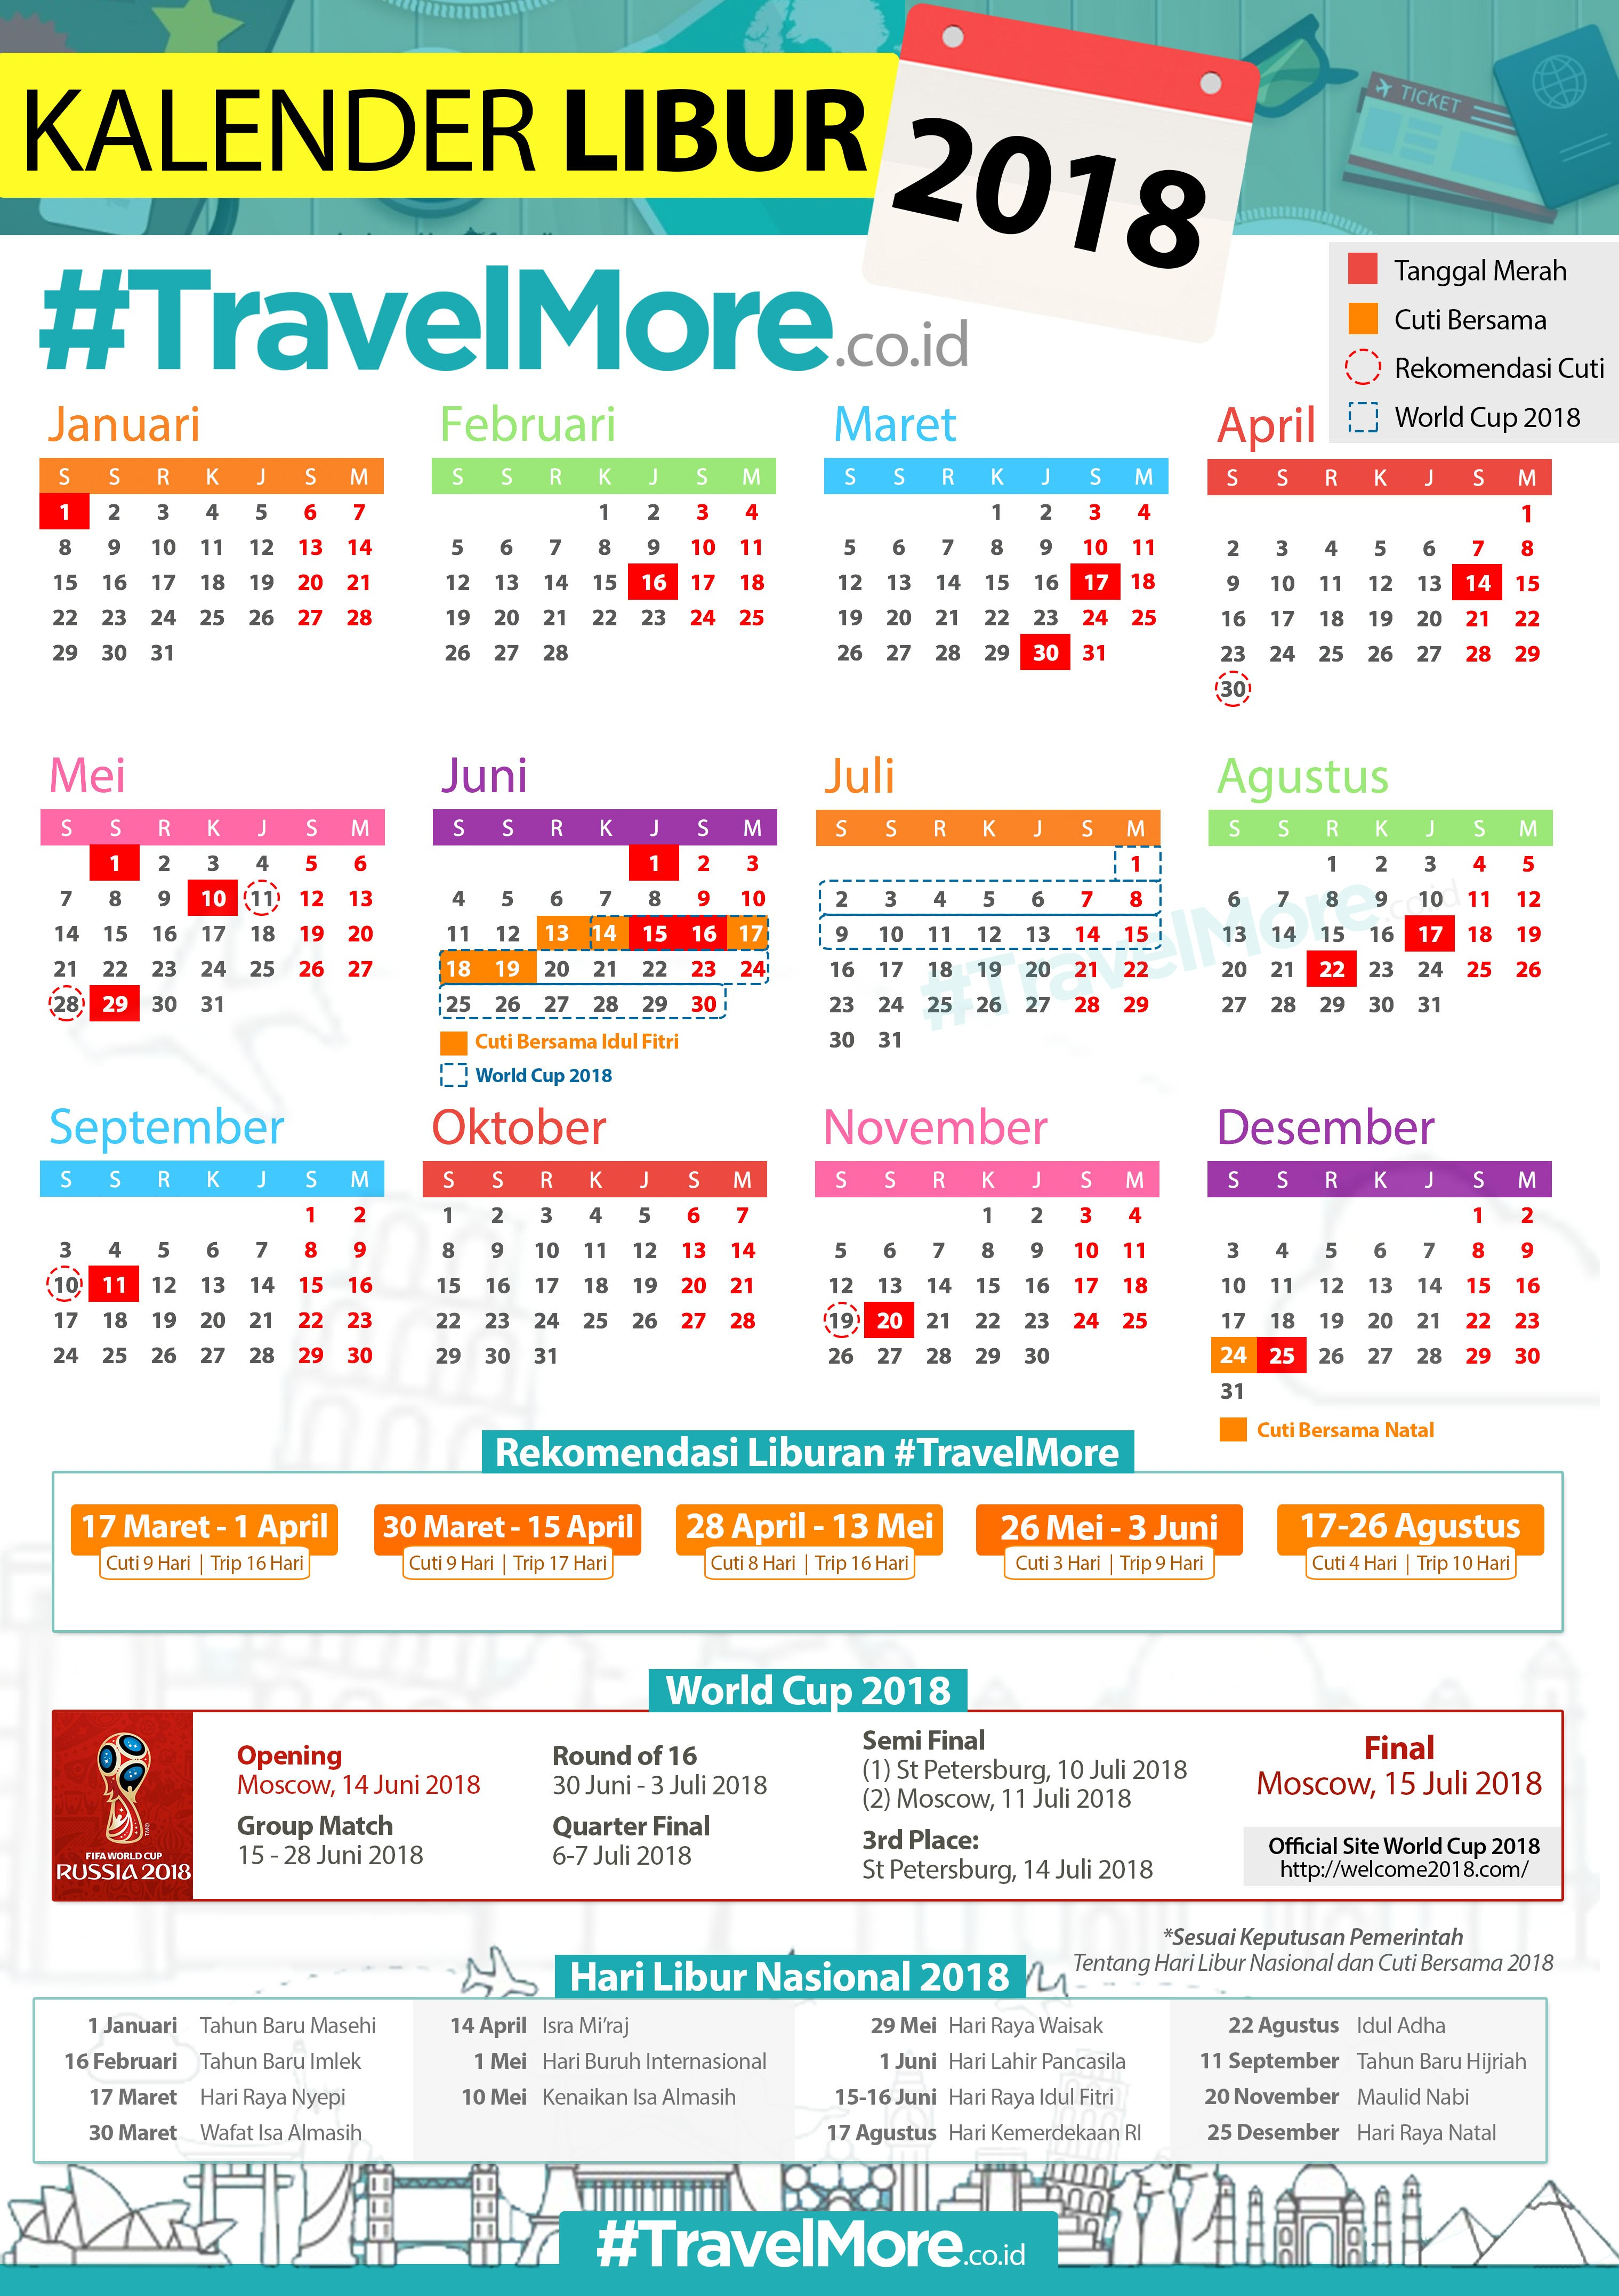 Download Kalender Libur 2018 3 Mb